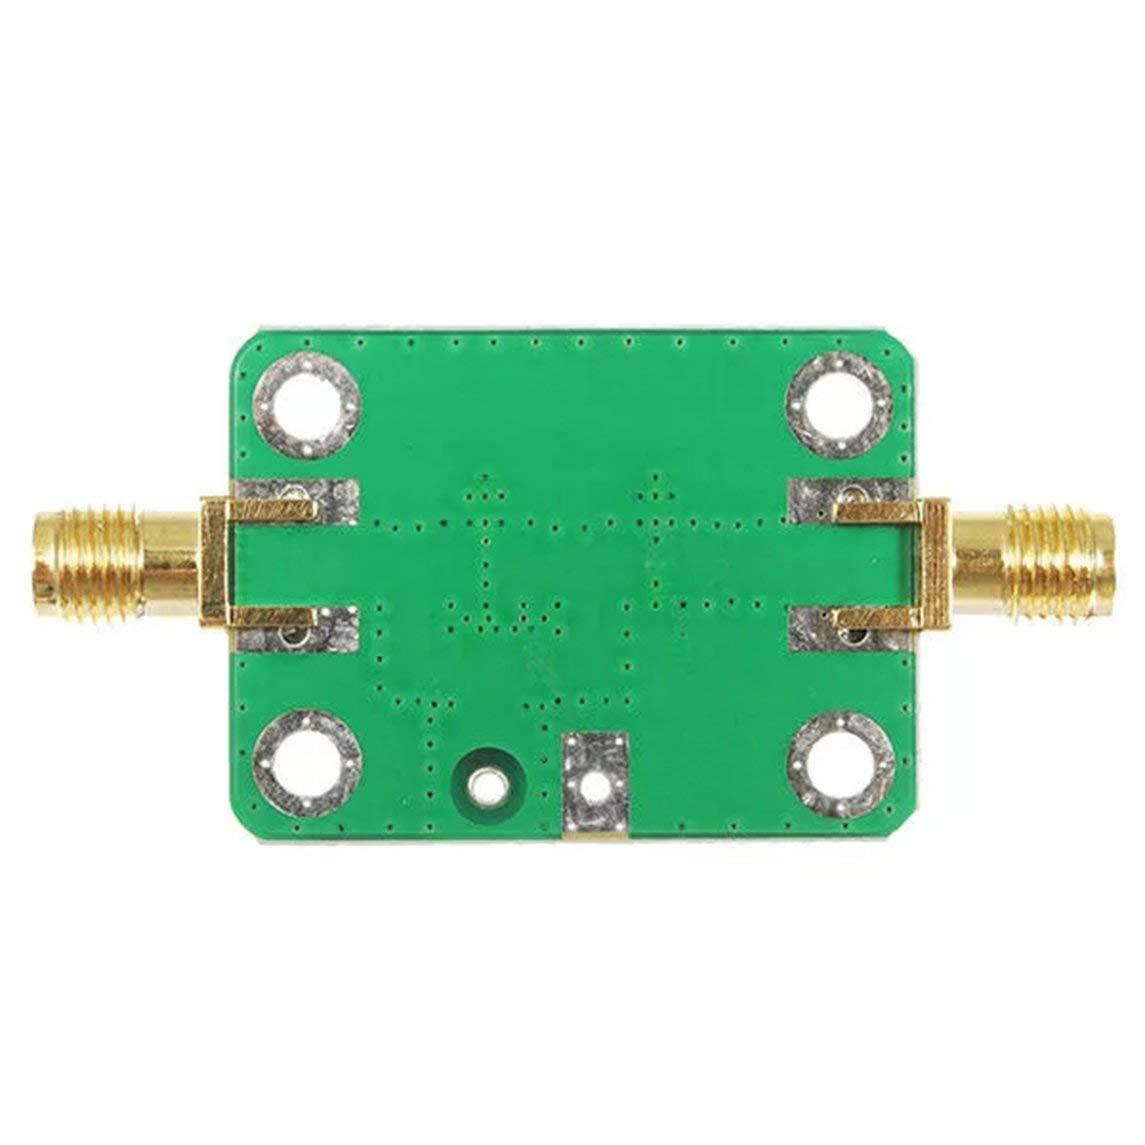 YXTFN 30-4000Mhz 40Db Gain Rf Broadband Amplifier Module for Fm Hf VHF/Uhf 50Ω UBS by Magicalworld (Image #6)